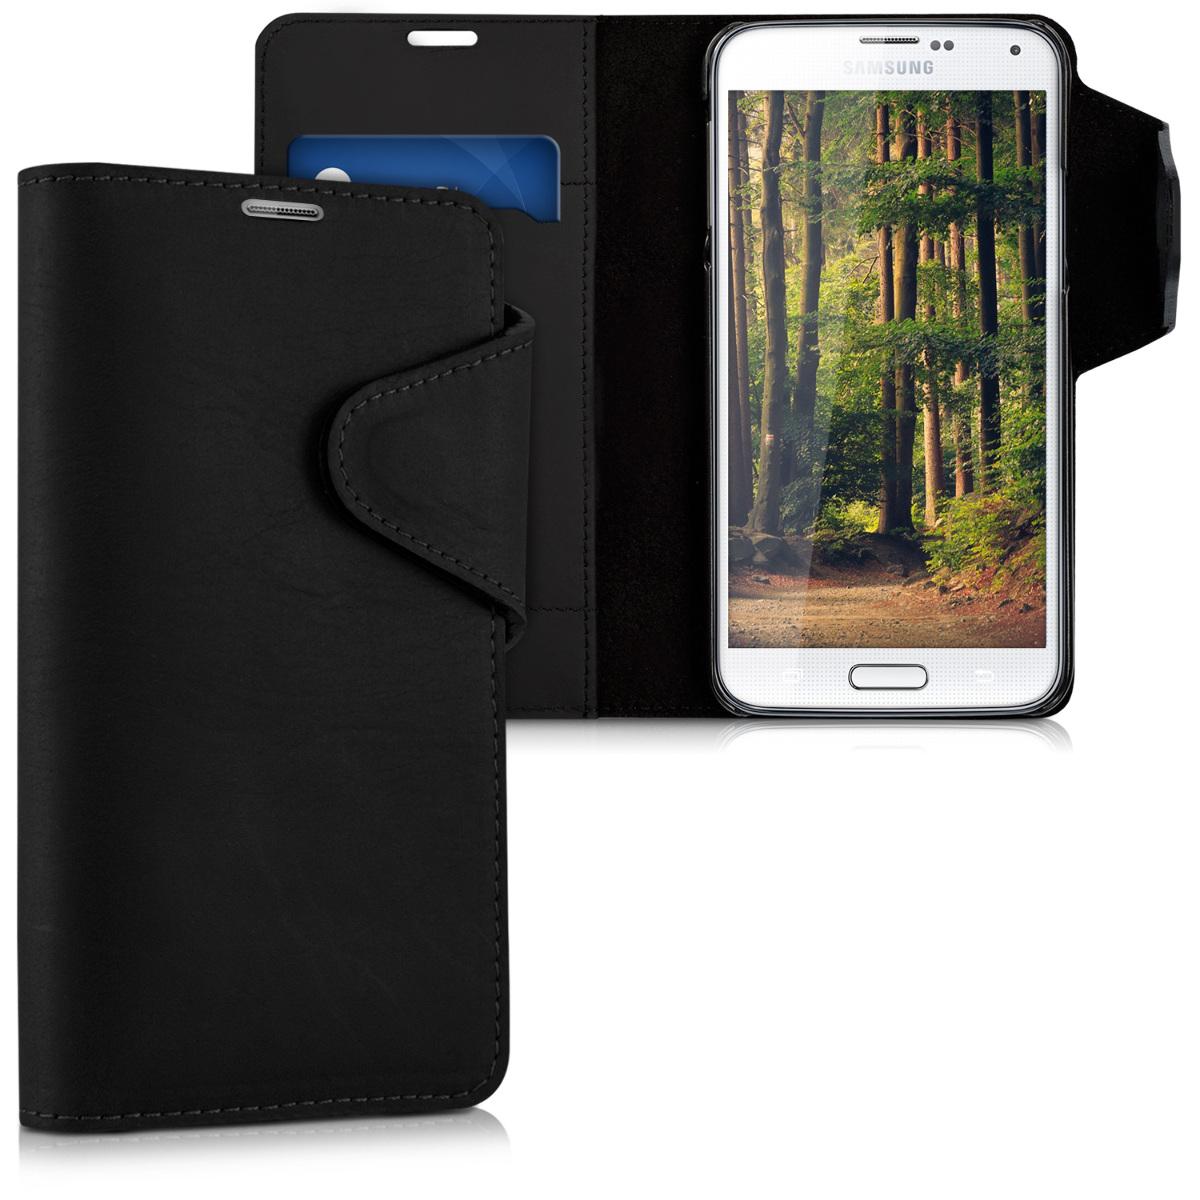 Kalibri Δερμάτινη Suede Θήκη - Πορτοφόλι Samsung Galaxy S5 / S5 Neo - Black (38796.01)